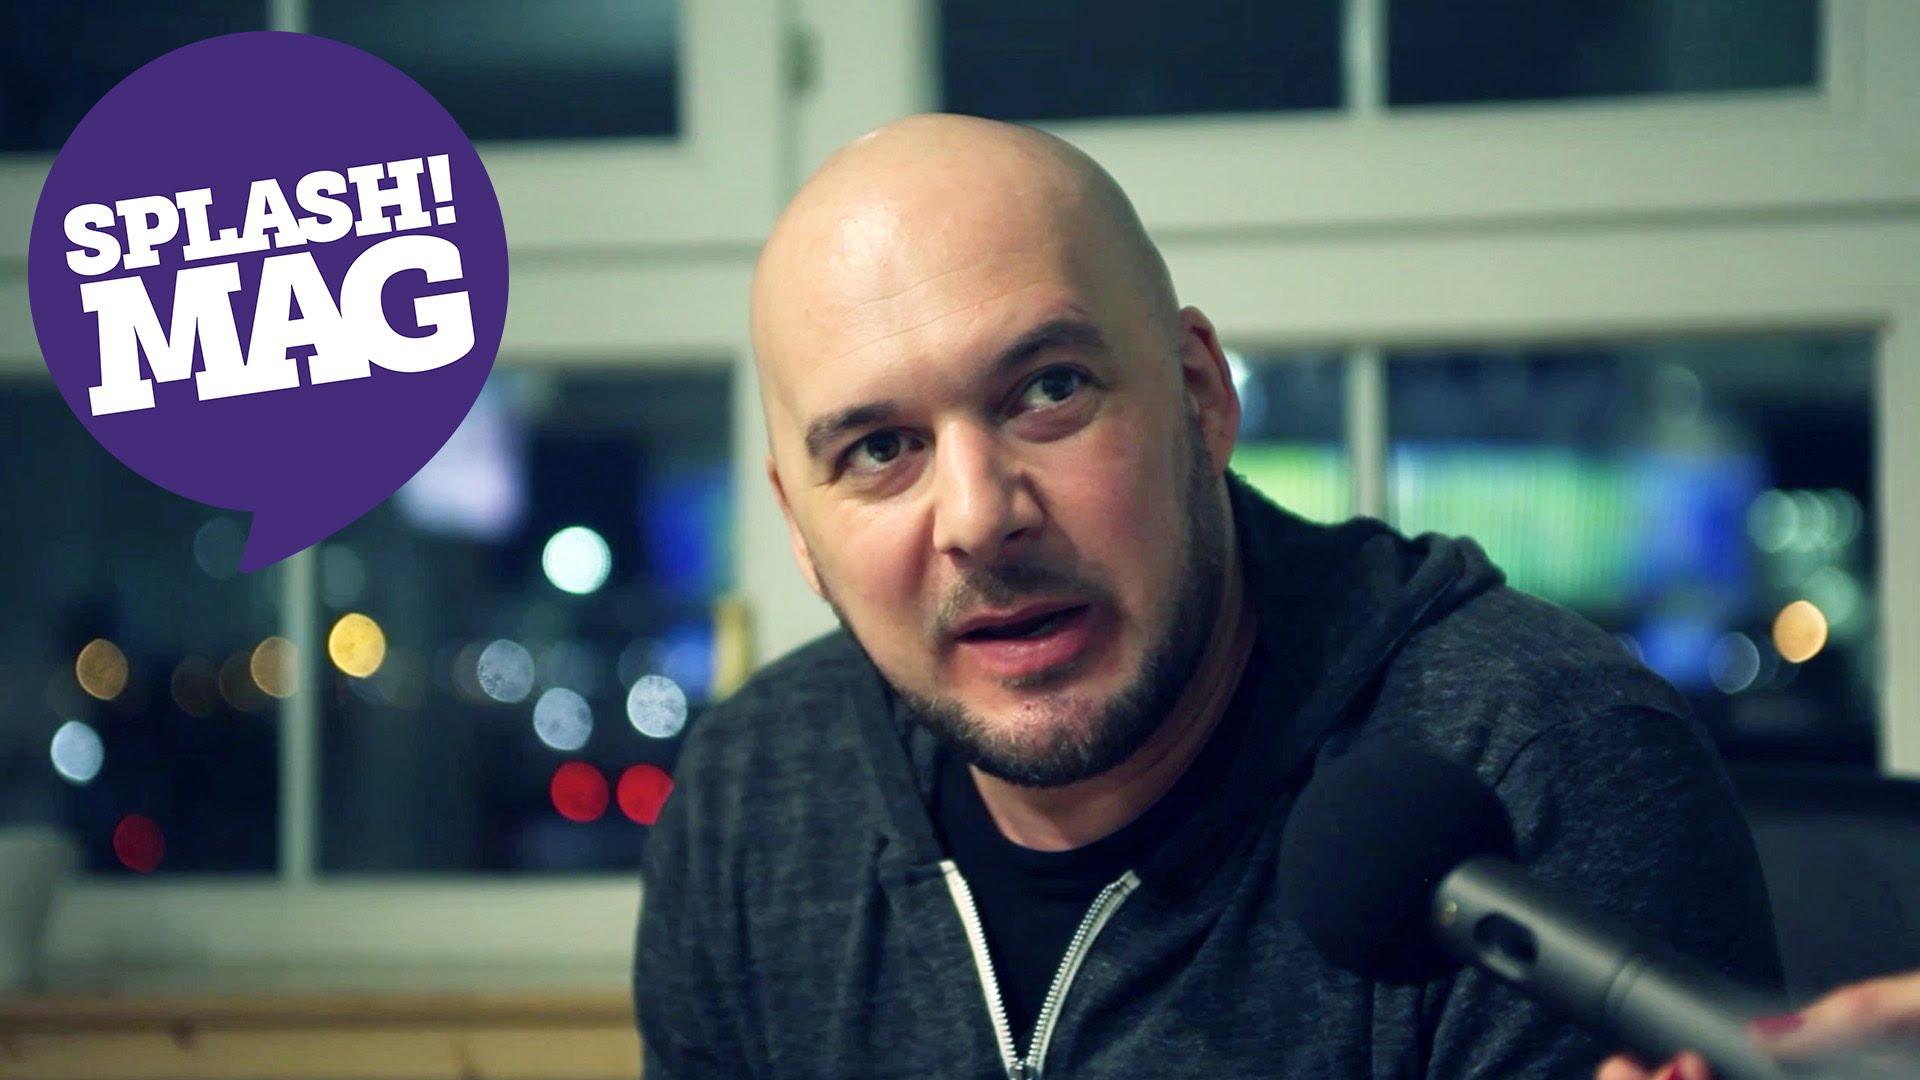 DCVDNS live @ splash! 20 // Video - splash! Mag